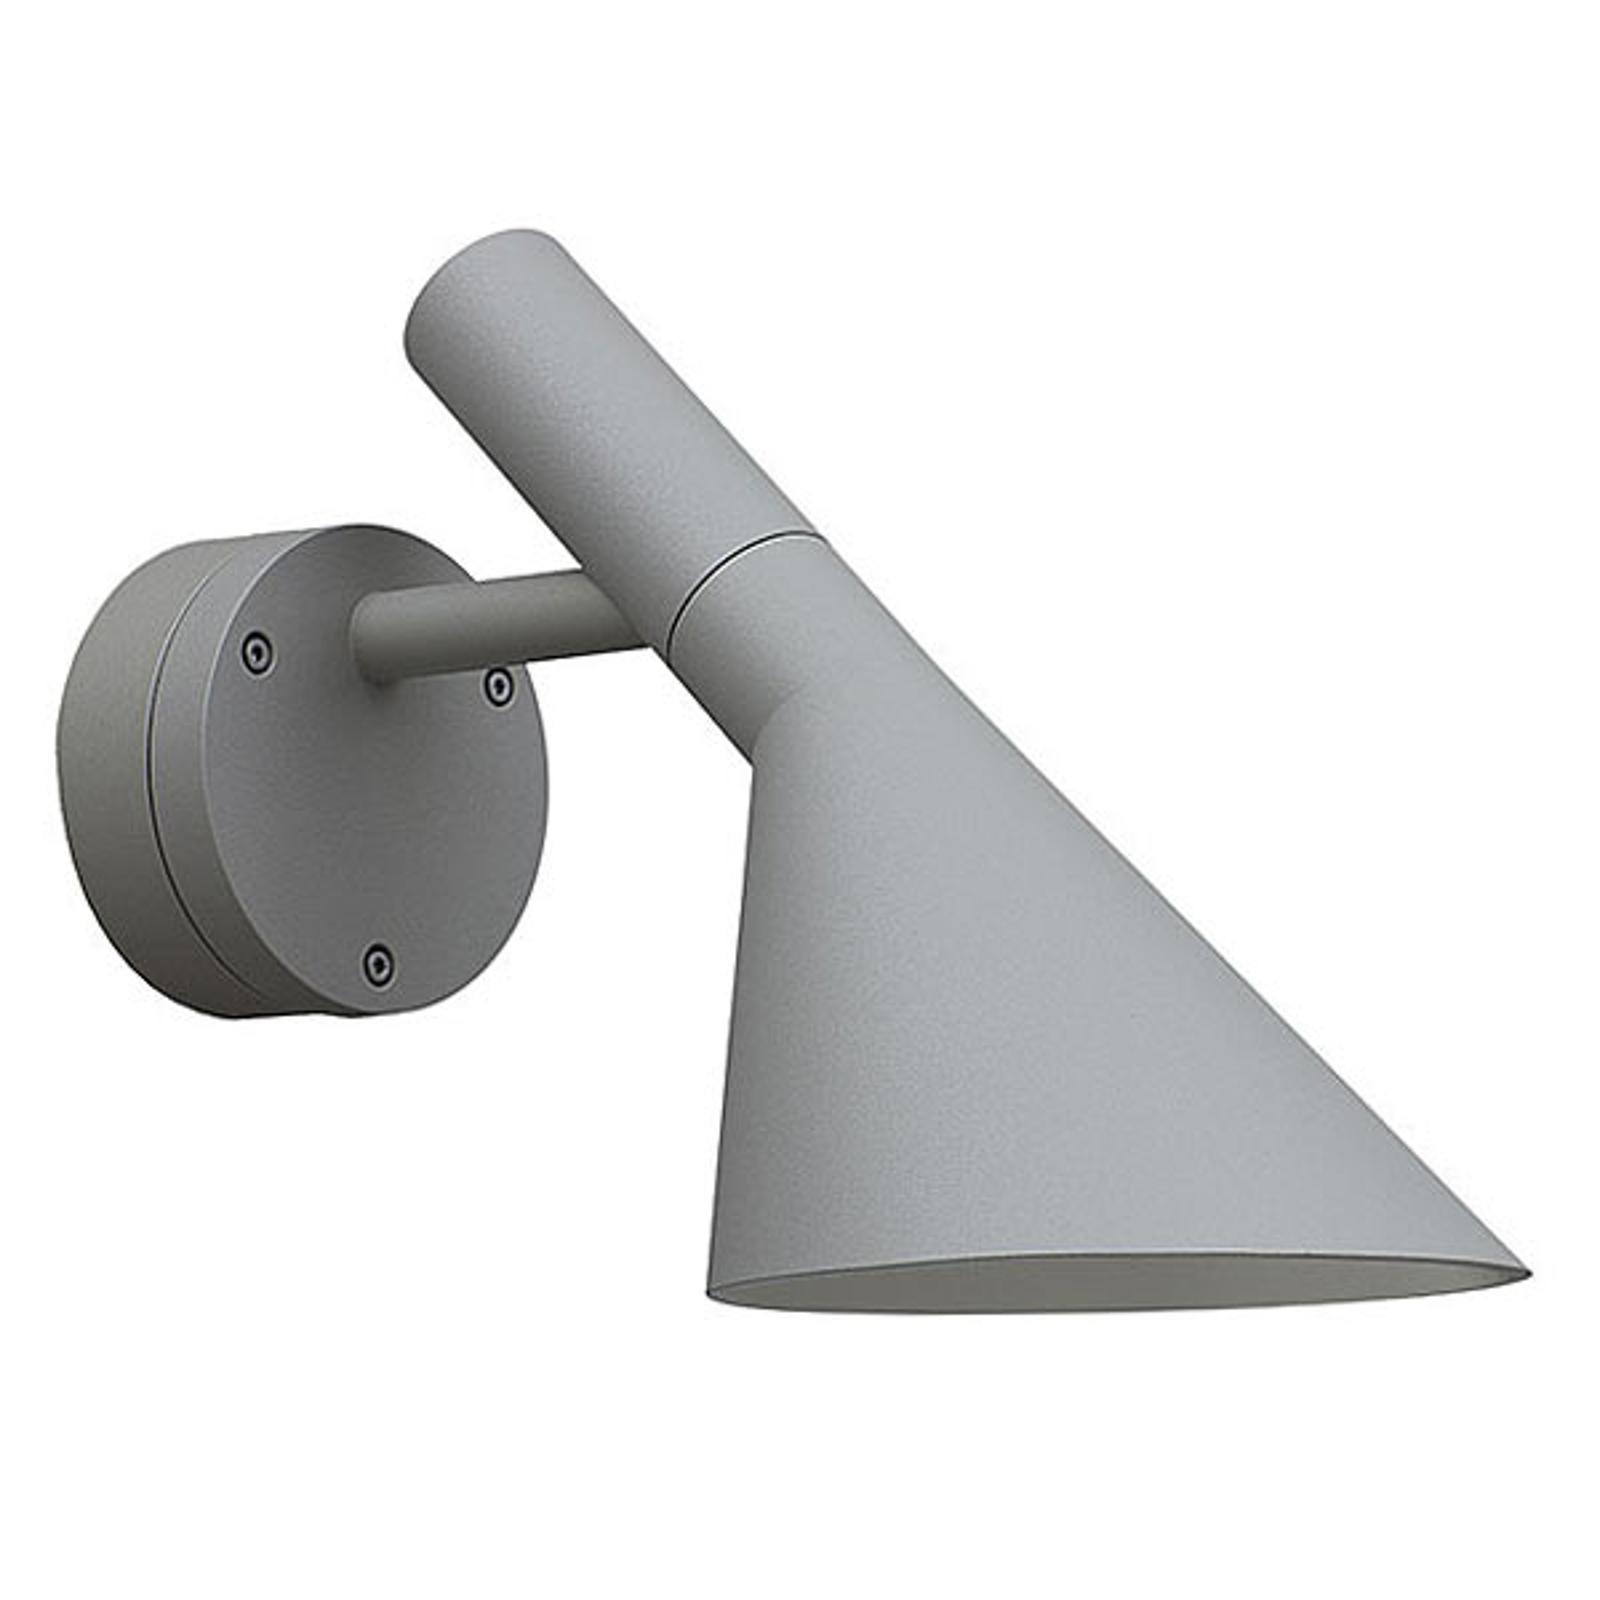 LED buiten wandlamp AJ 50, alu gestructureerd